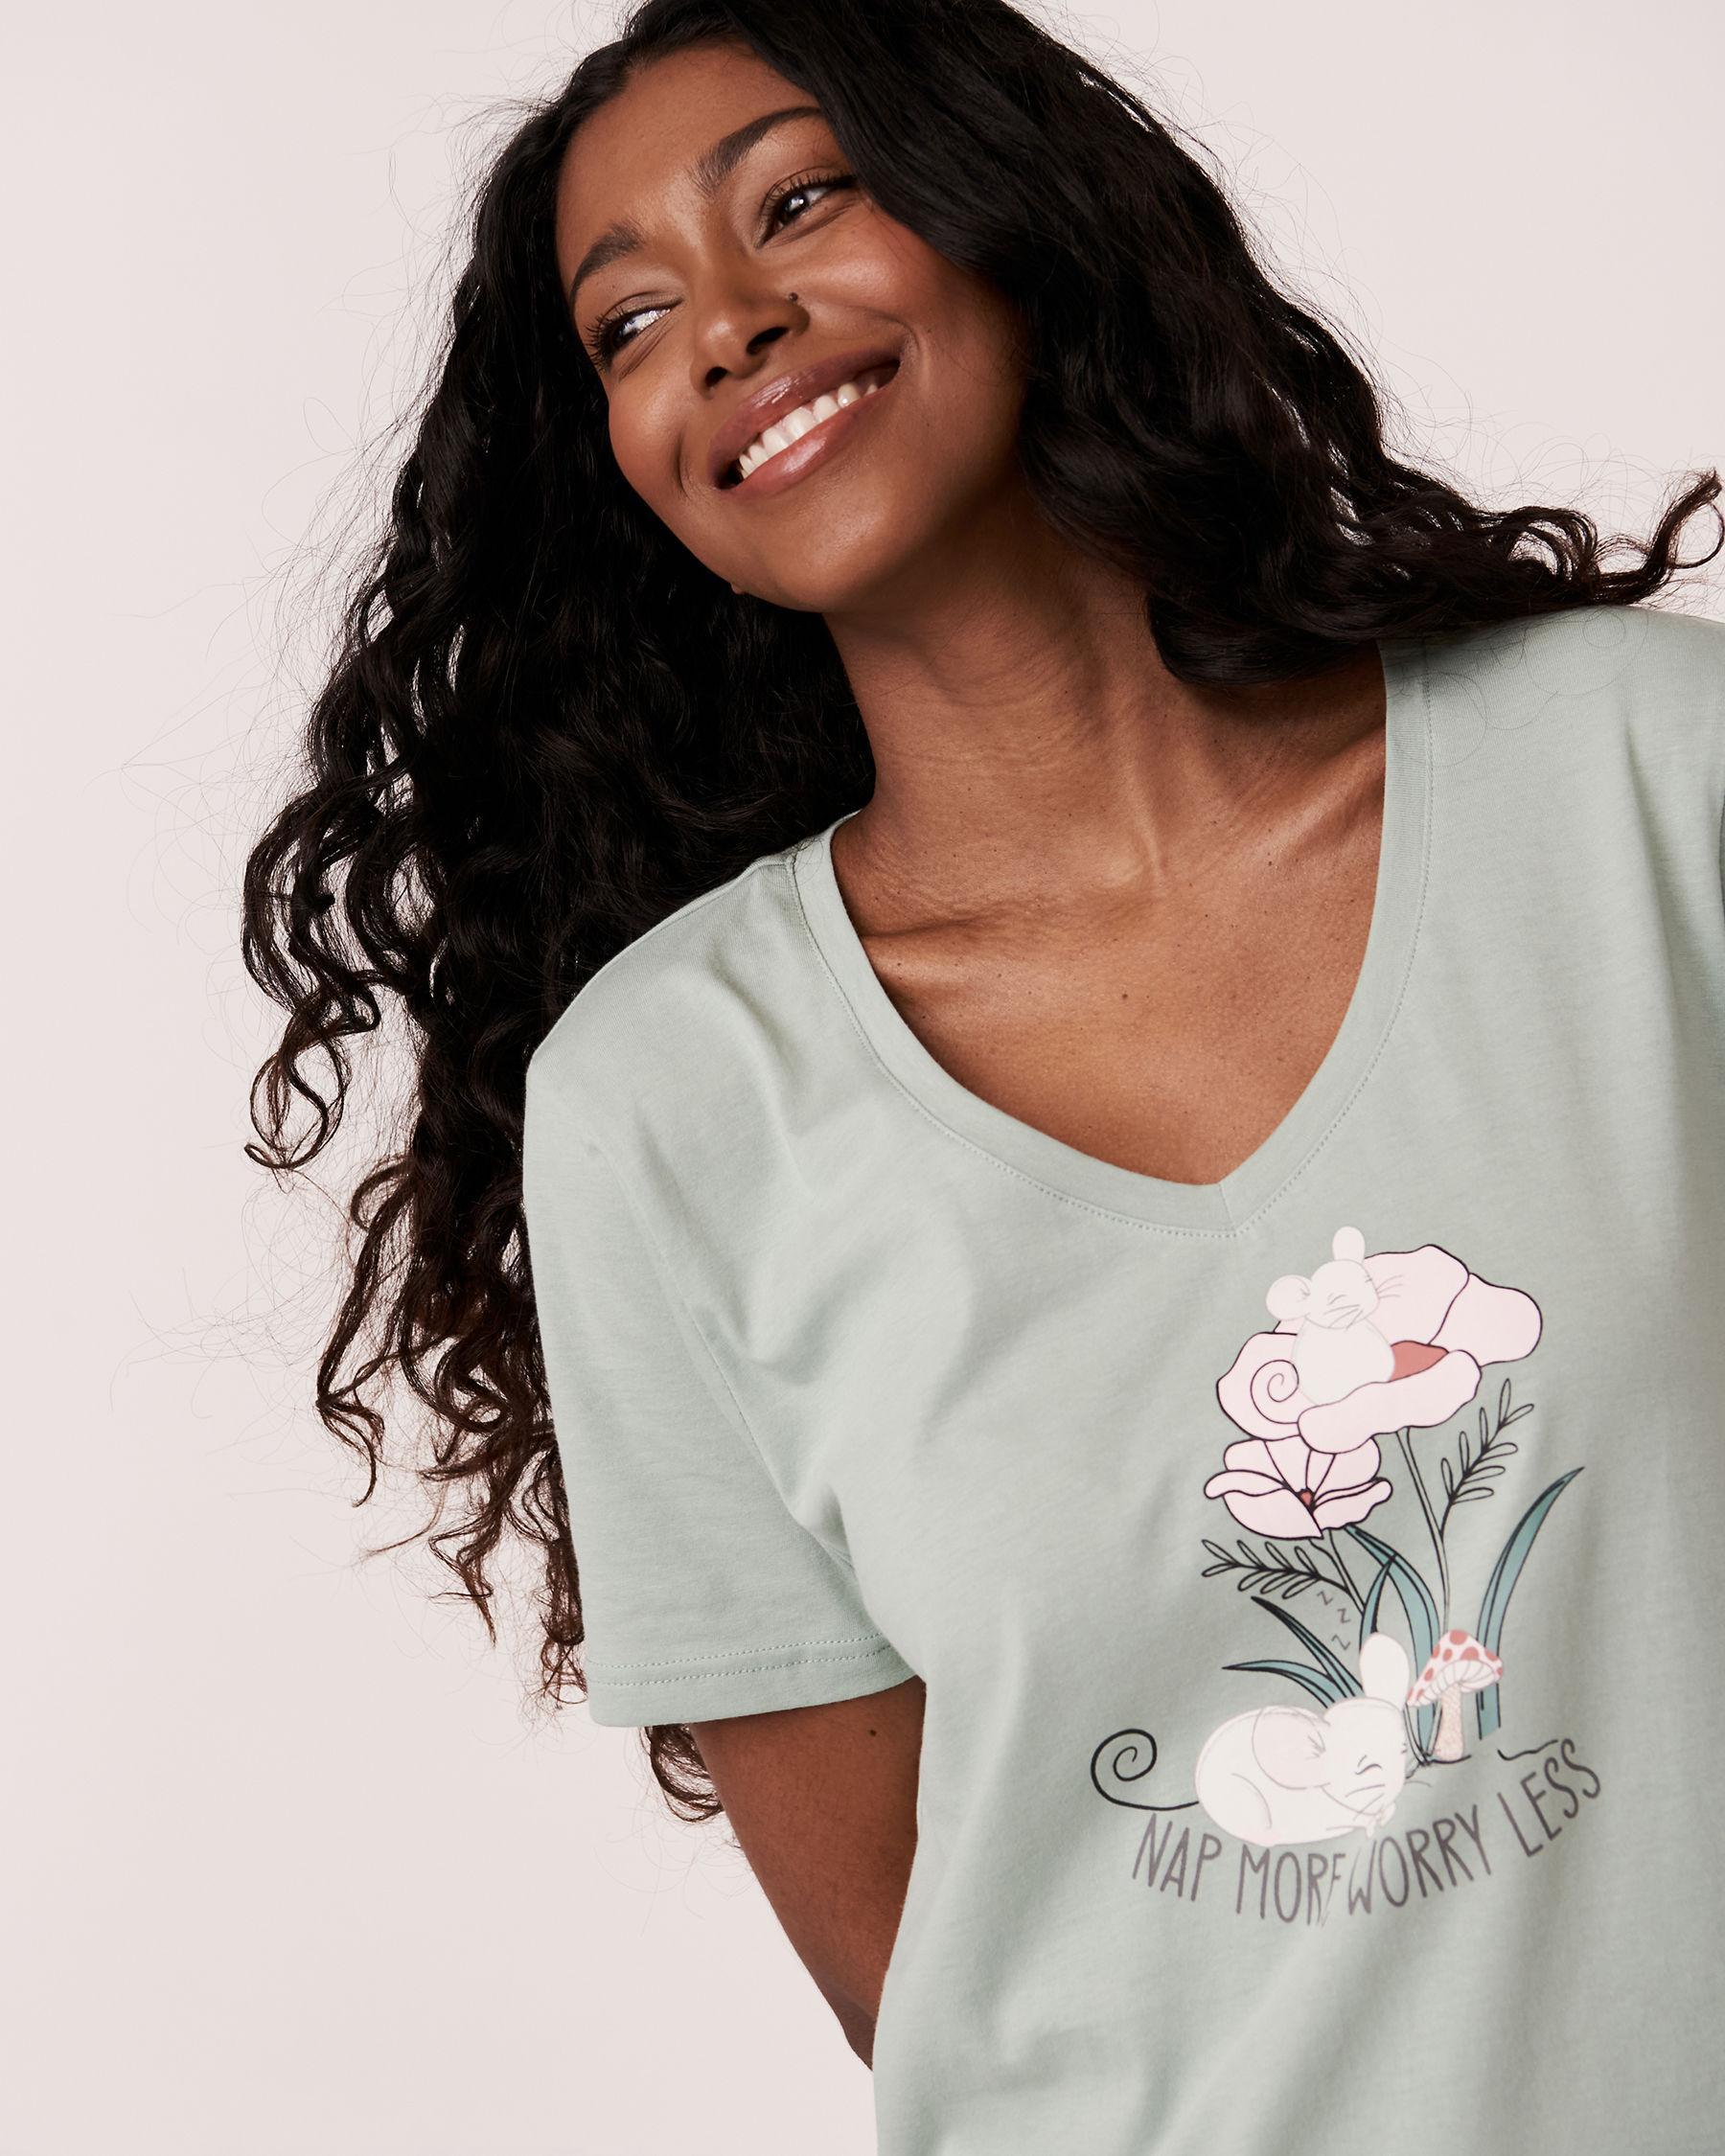 LA VIE EN ROSE V-neckline T-shirt Green 40100123 - View2